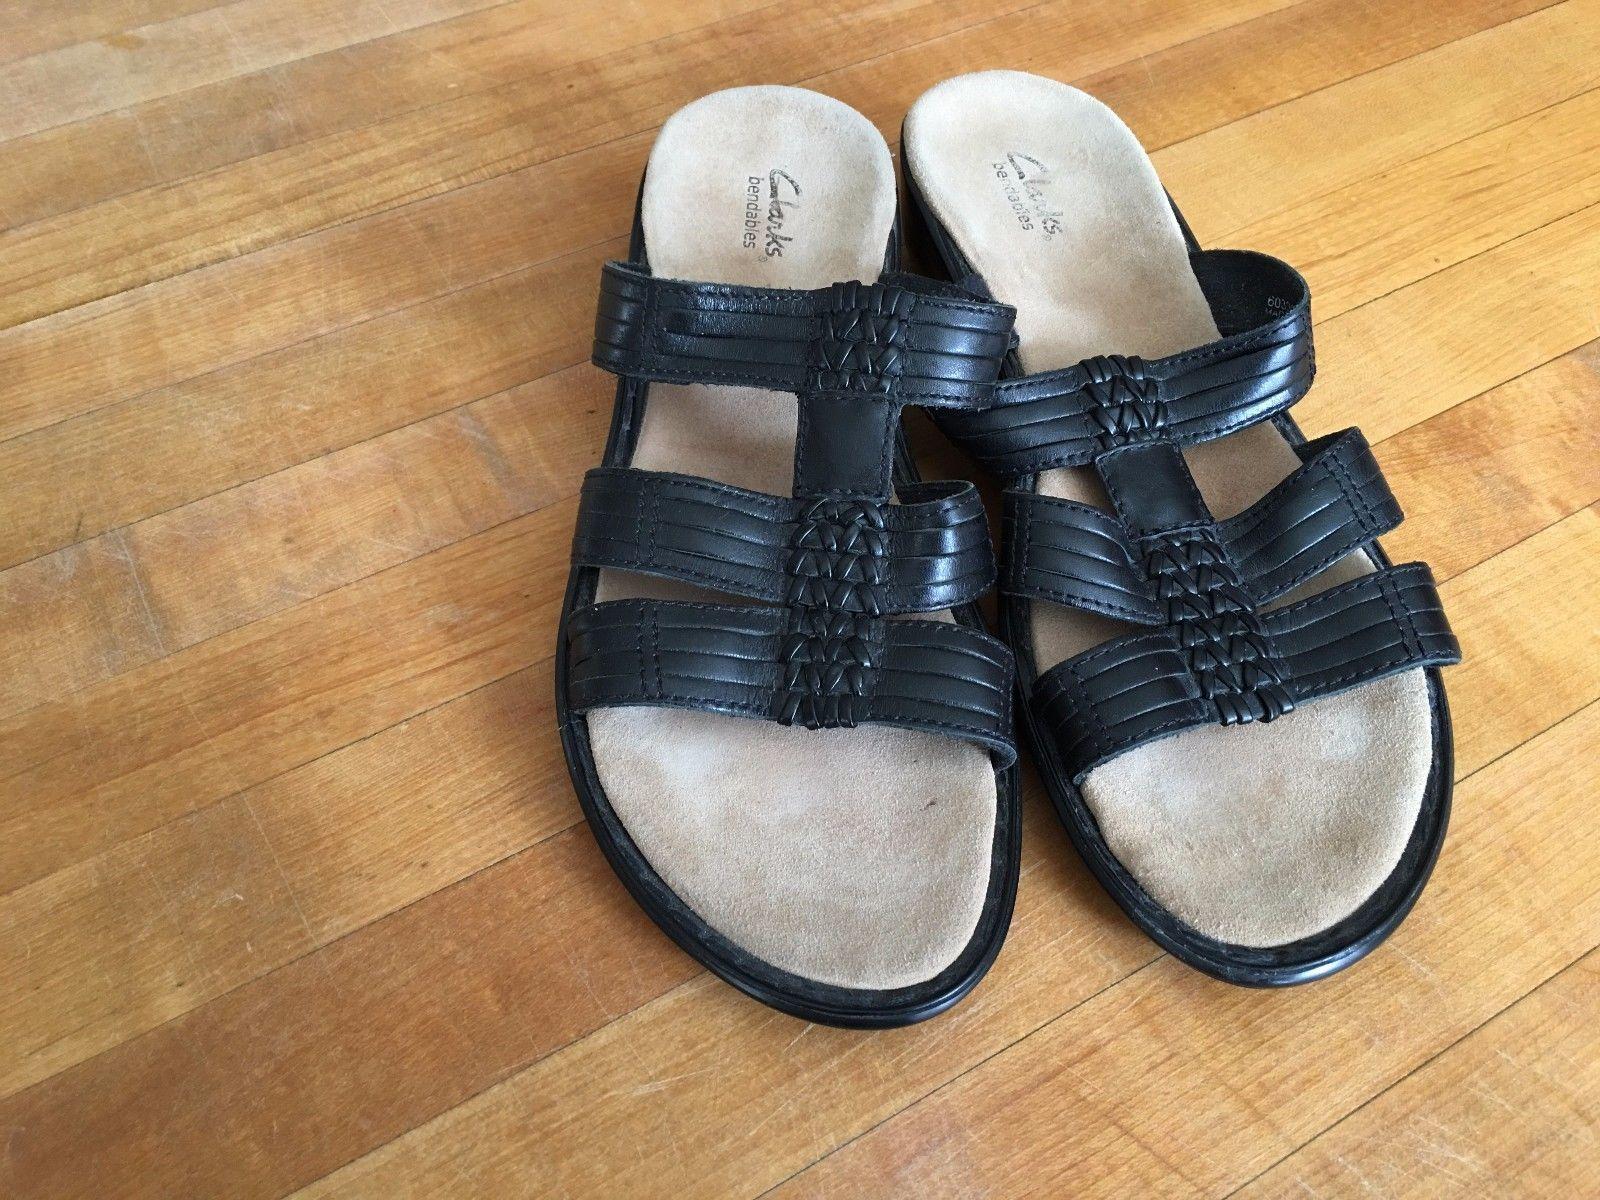 c5d4ae8cd5d CLARKS Bendables Women s Black Leather Slide Slip On Sandals Shoes Size -   37.39